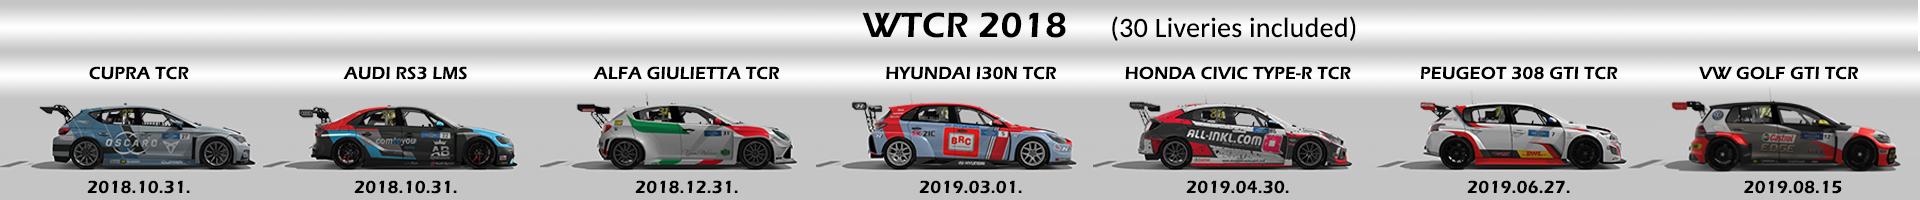 wtcr_progress_2018.jpg